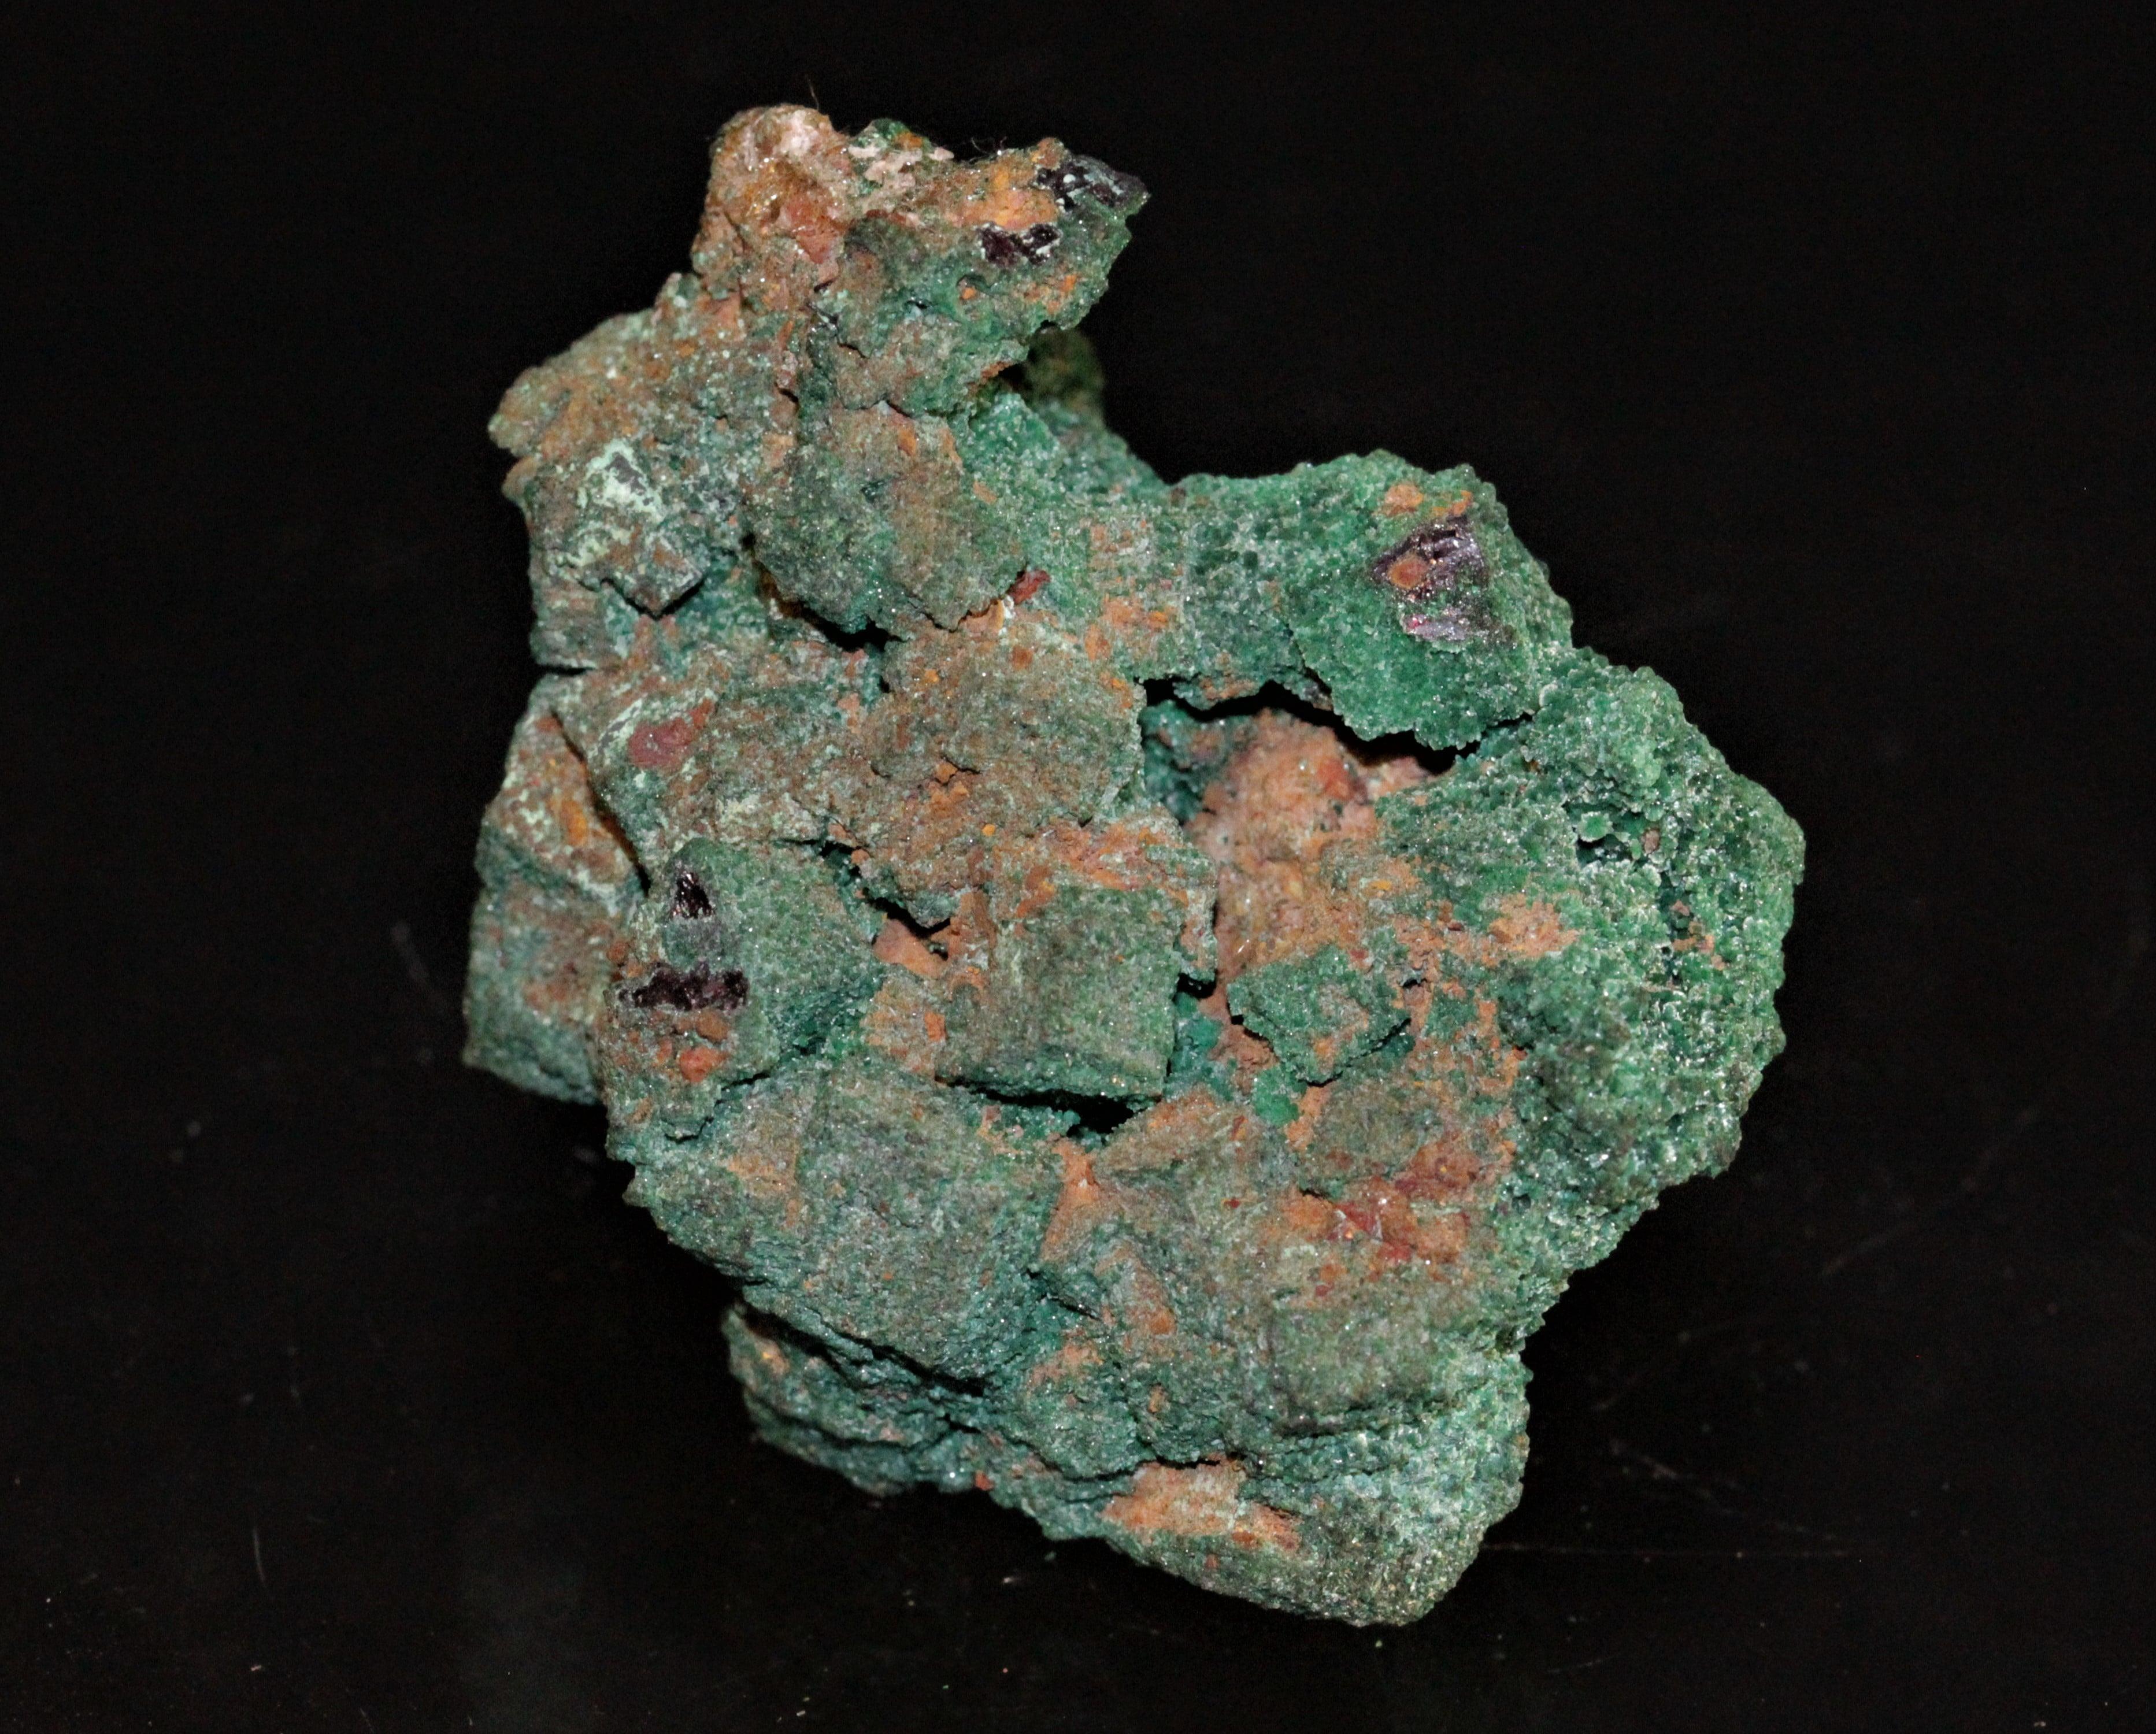 Cuprite pseudomorphosée en malachite de la mine d'Ogonja (Onganja) en Namibie.